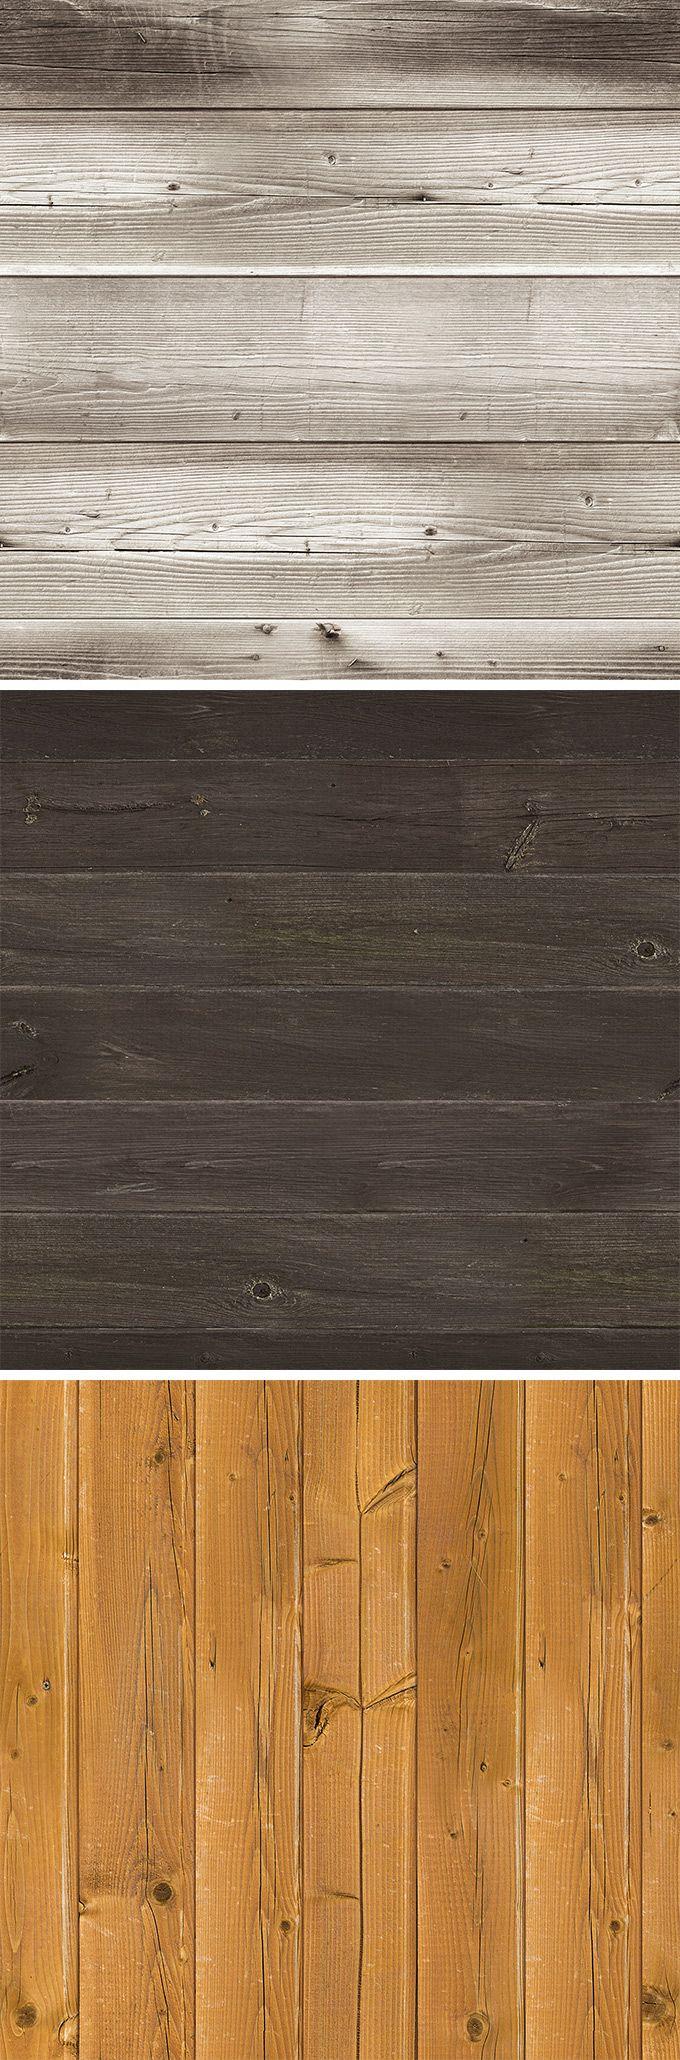 Free 3 Hi-Res Seamless Wood Textures (20MB)   pixelbuddha.net